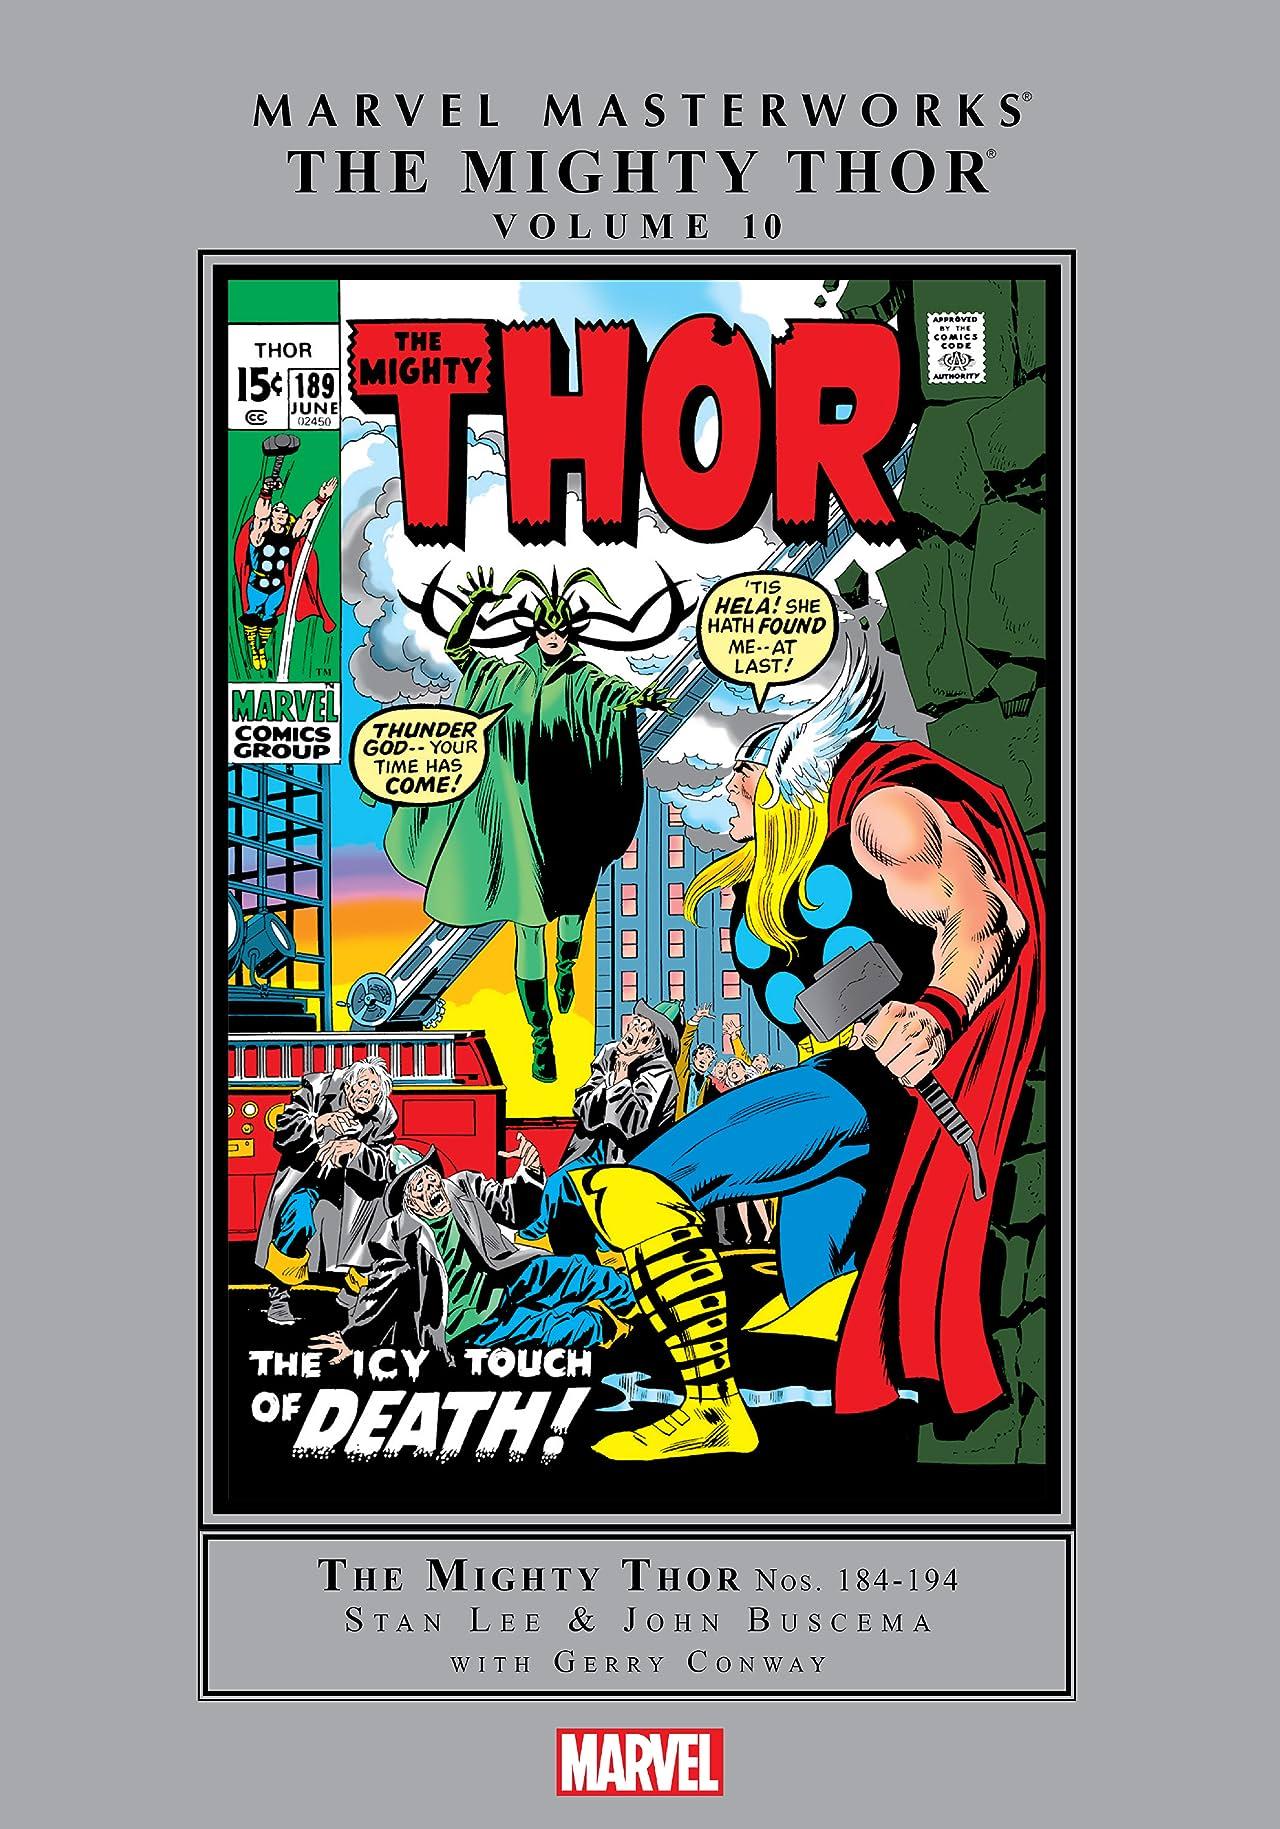 Thor Masterworks Vol. 10